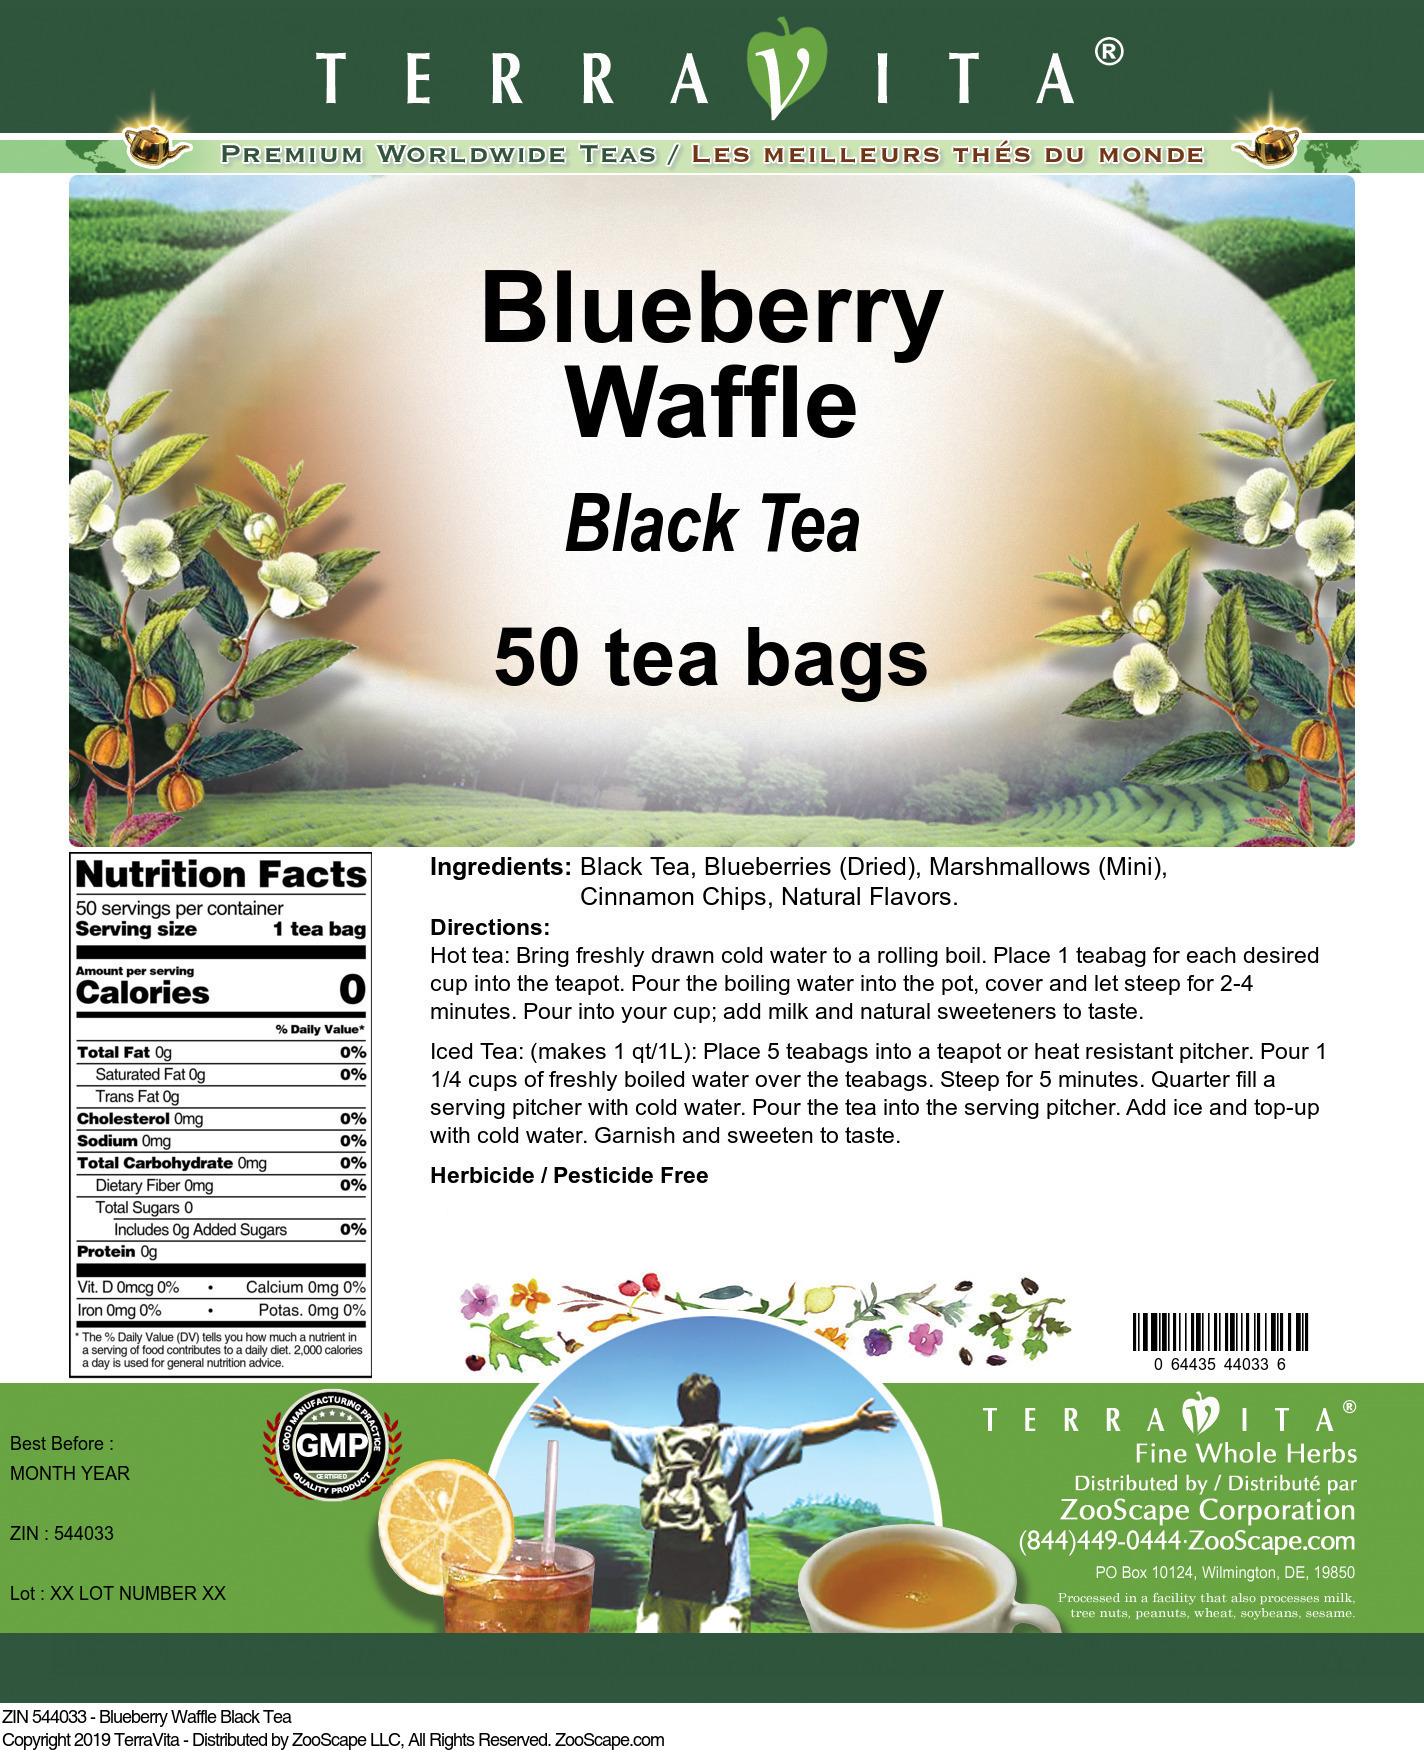 Blueberry Waffle Black Tea